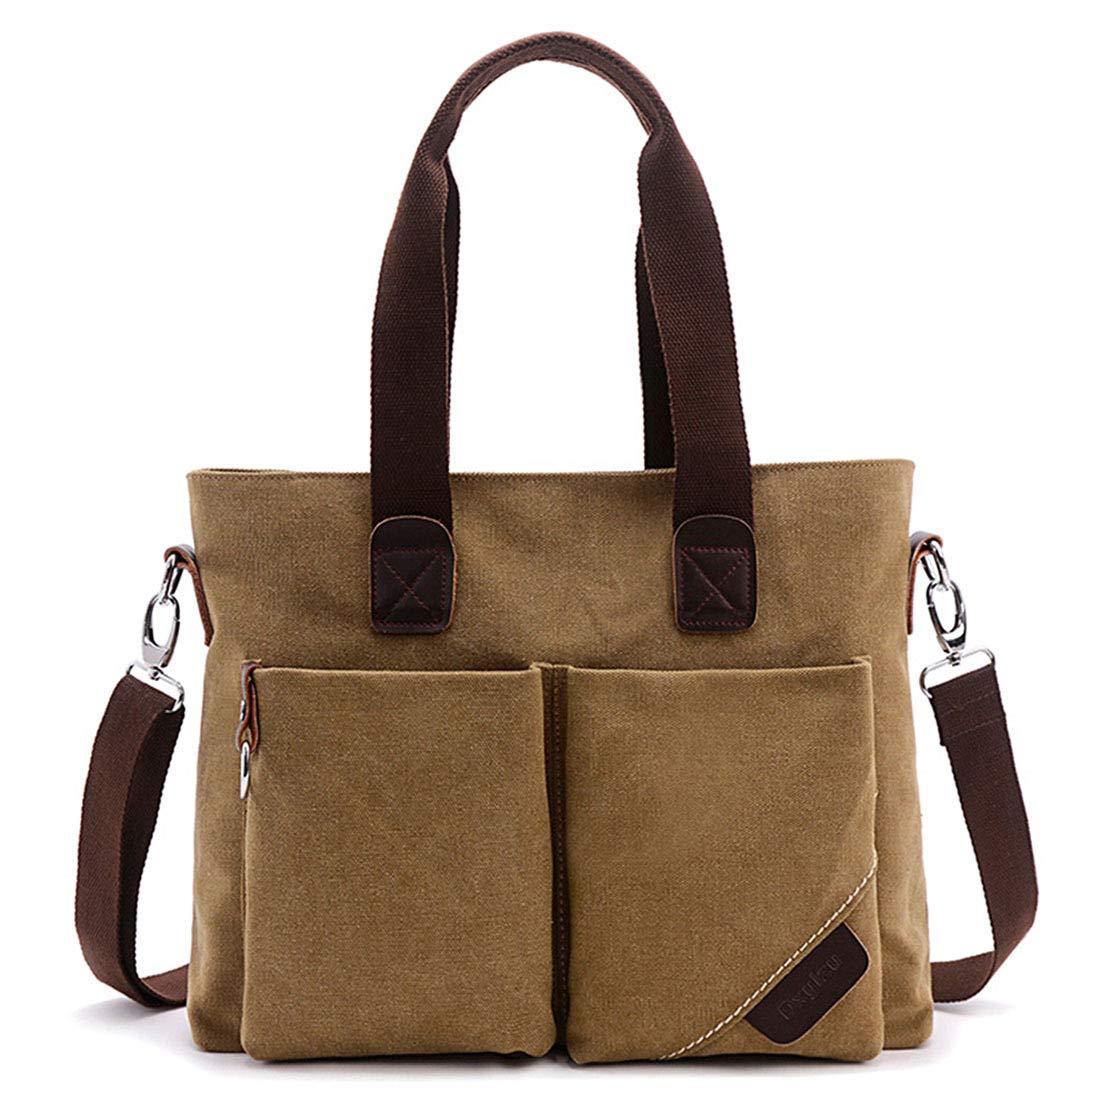 ToLFE Women Top Handle Satchel Handbags Tote Purse Shoulder Bag (Khaki-(Large)) by ToLFE (Image #3)